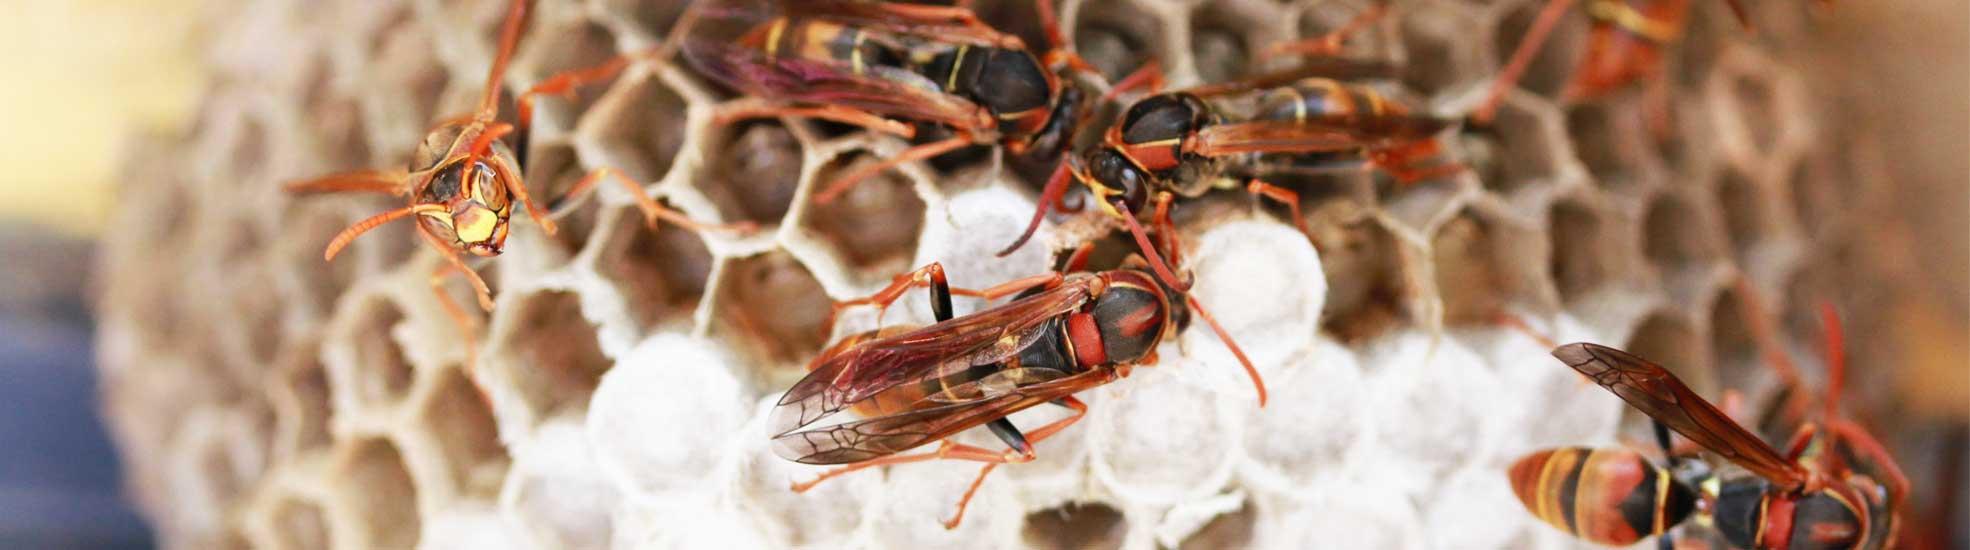 General-Pest-Inspections-Sydney-Dylan-Cope-Pest-Control